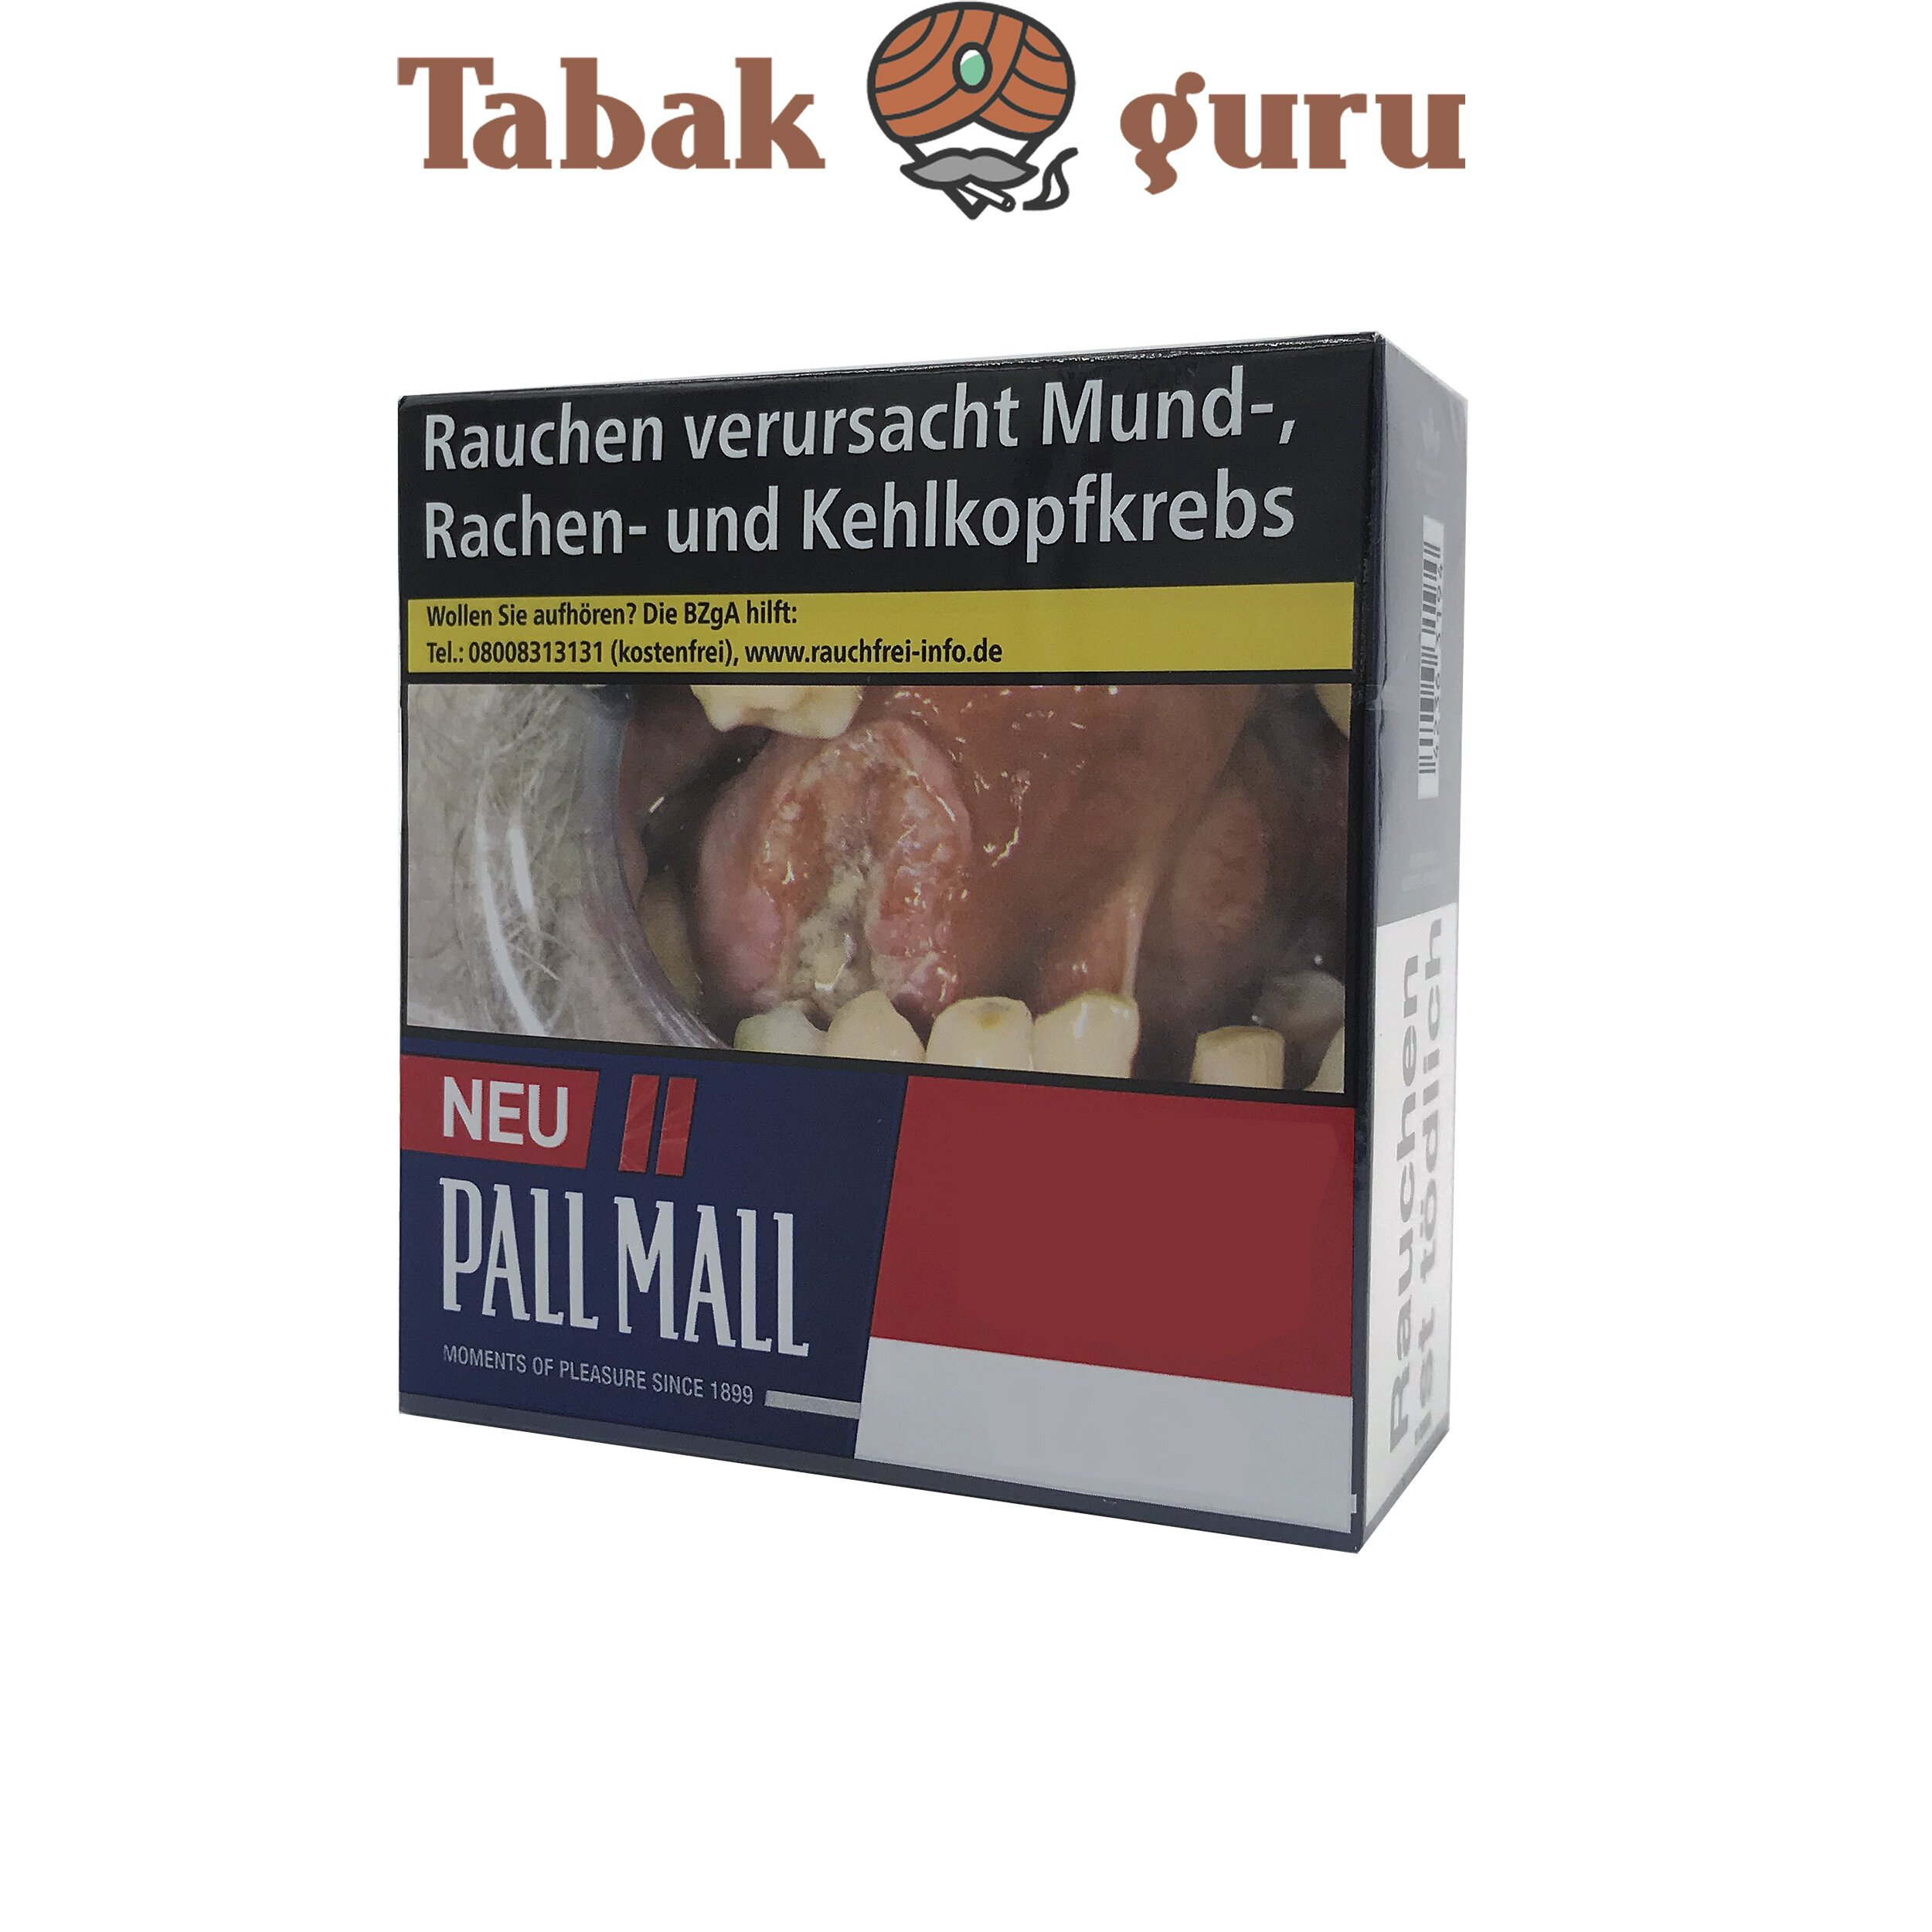 Pall Mall Red / Rot Zigaretten Jumbo Box (49 Stück)